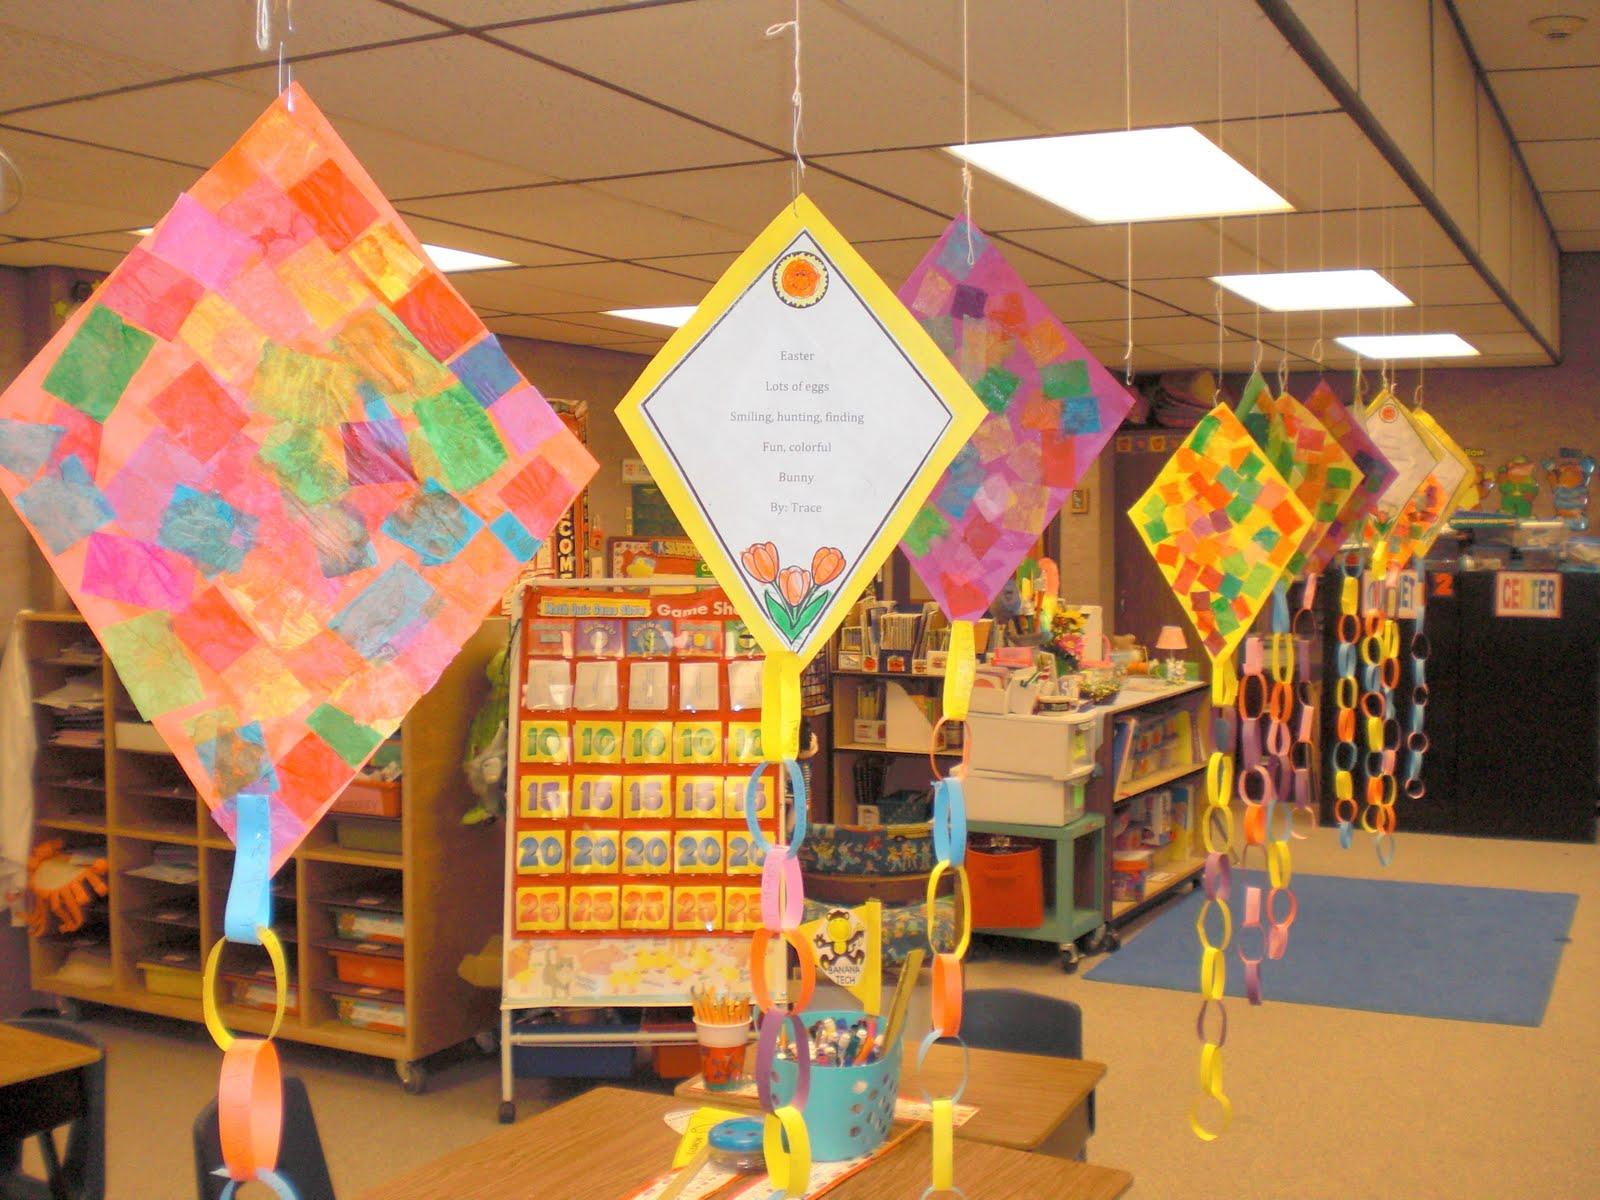 Classroom Hanging Decor ~ Hanging ceiling decorations for classroom lightneasy